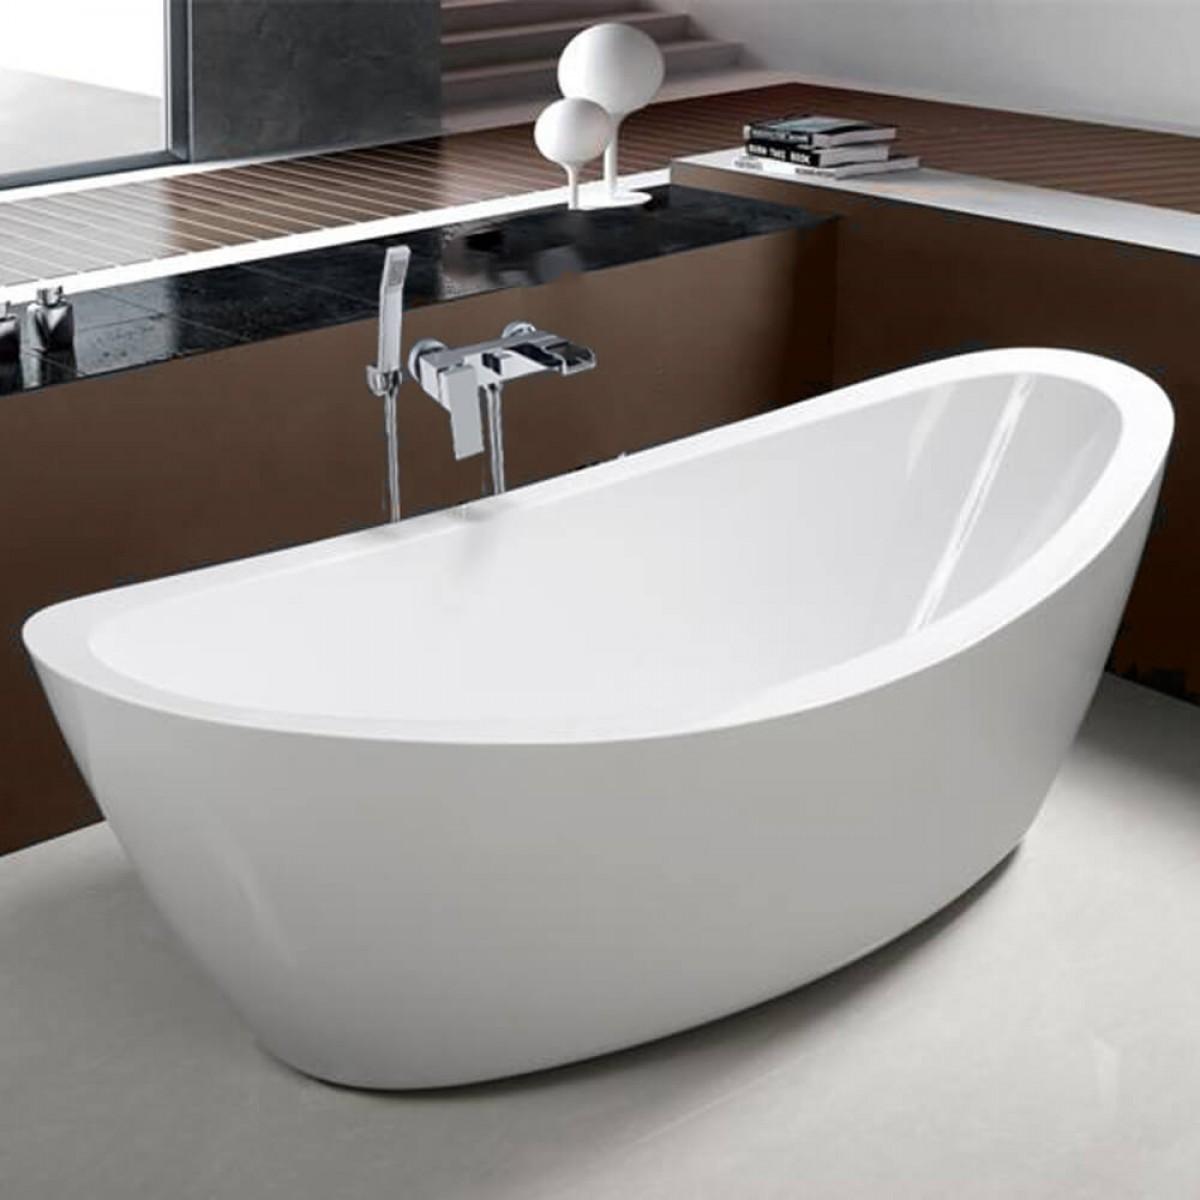 kirsty acrylic white freestanding bathtub - 1800 x 850mm XSHBINB